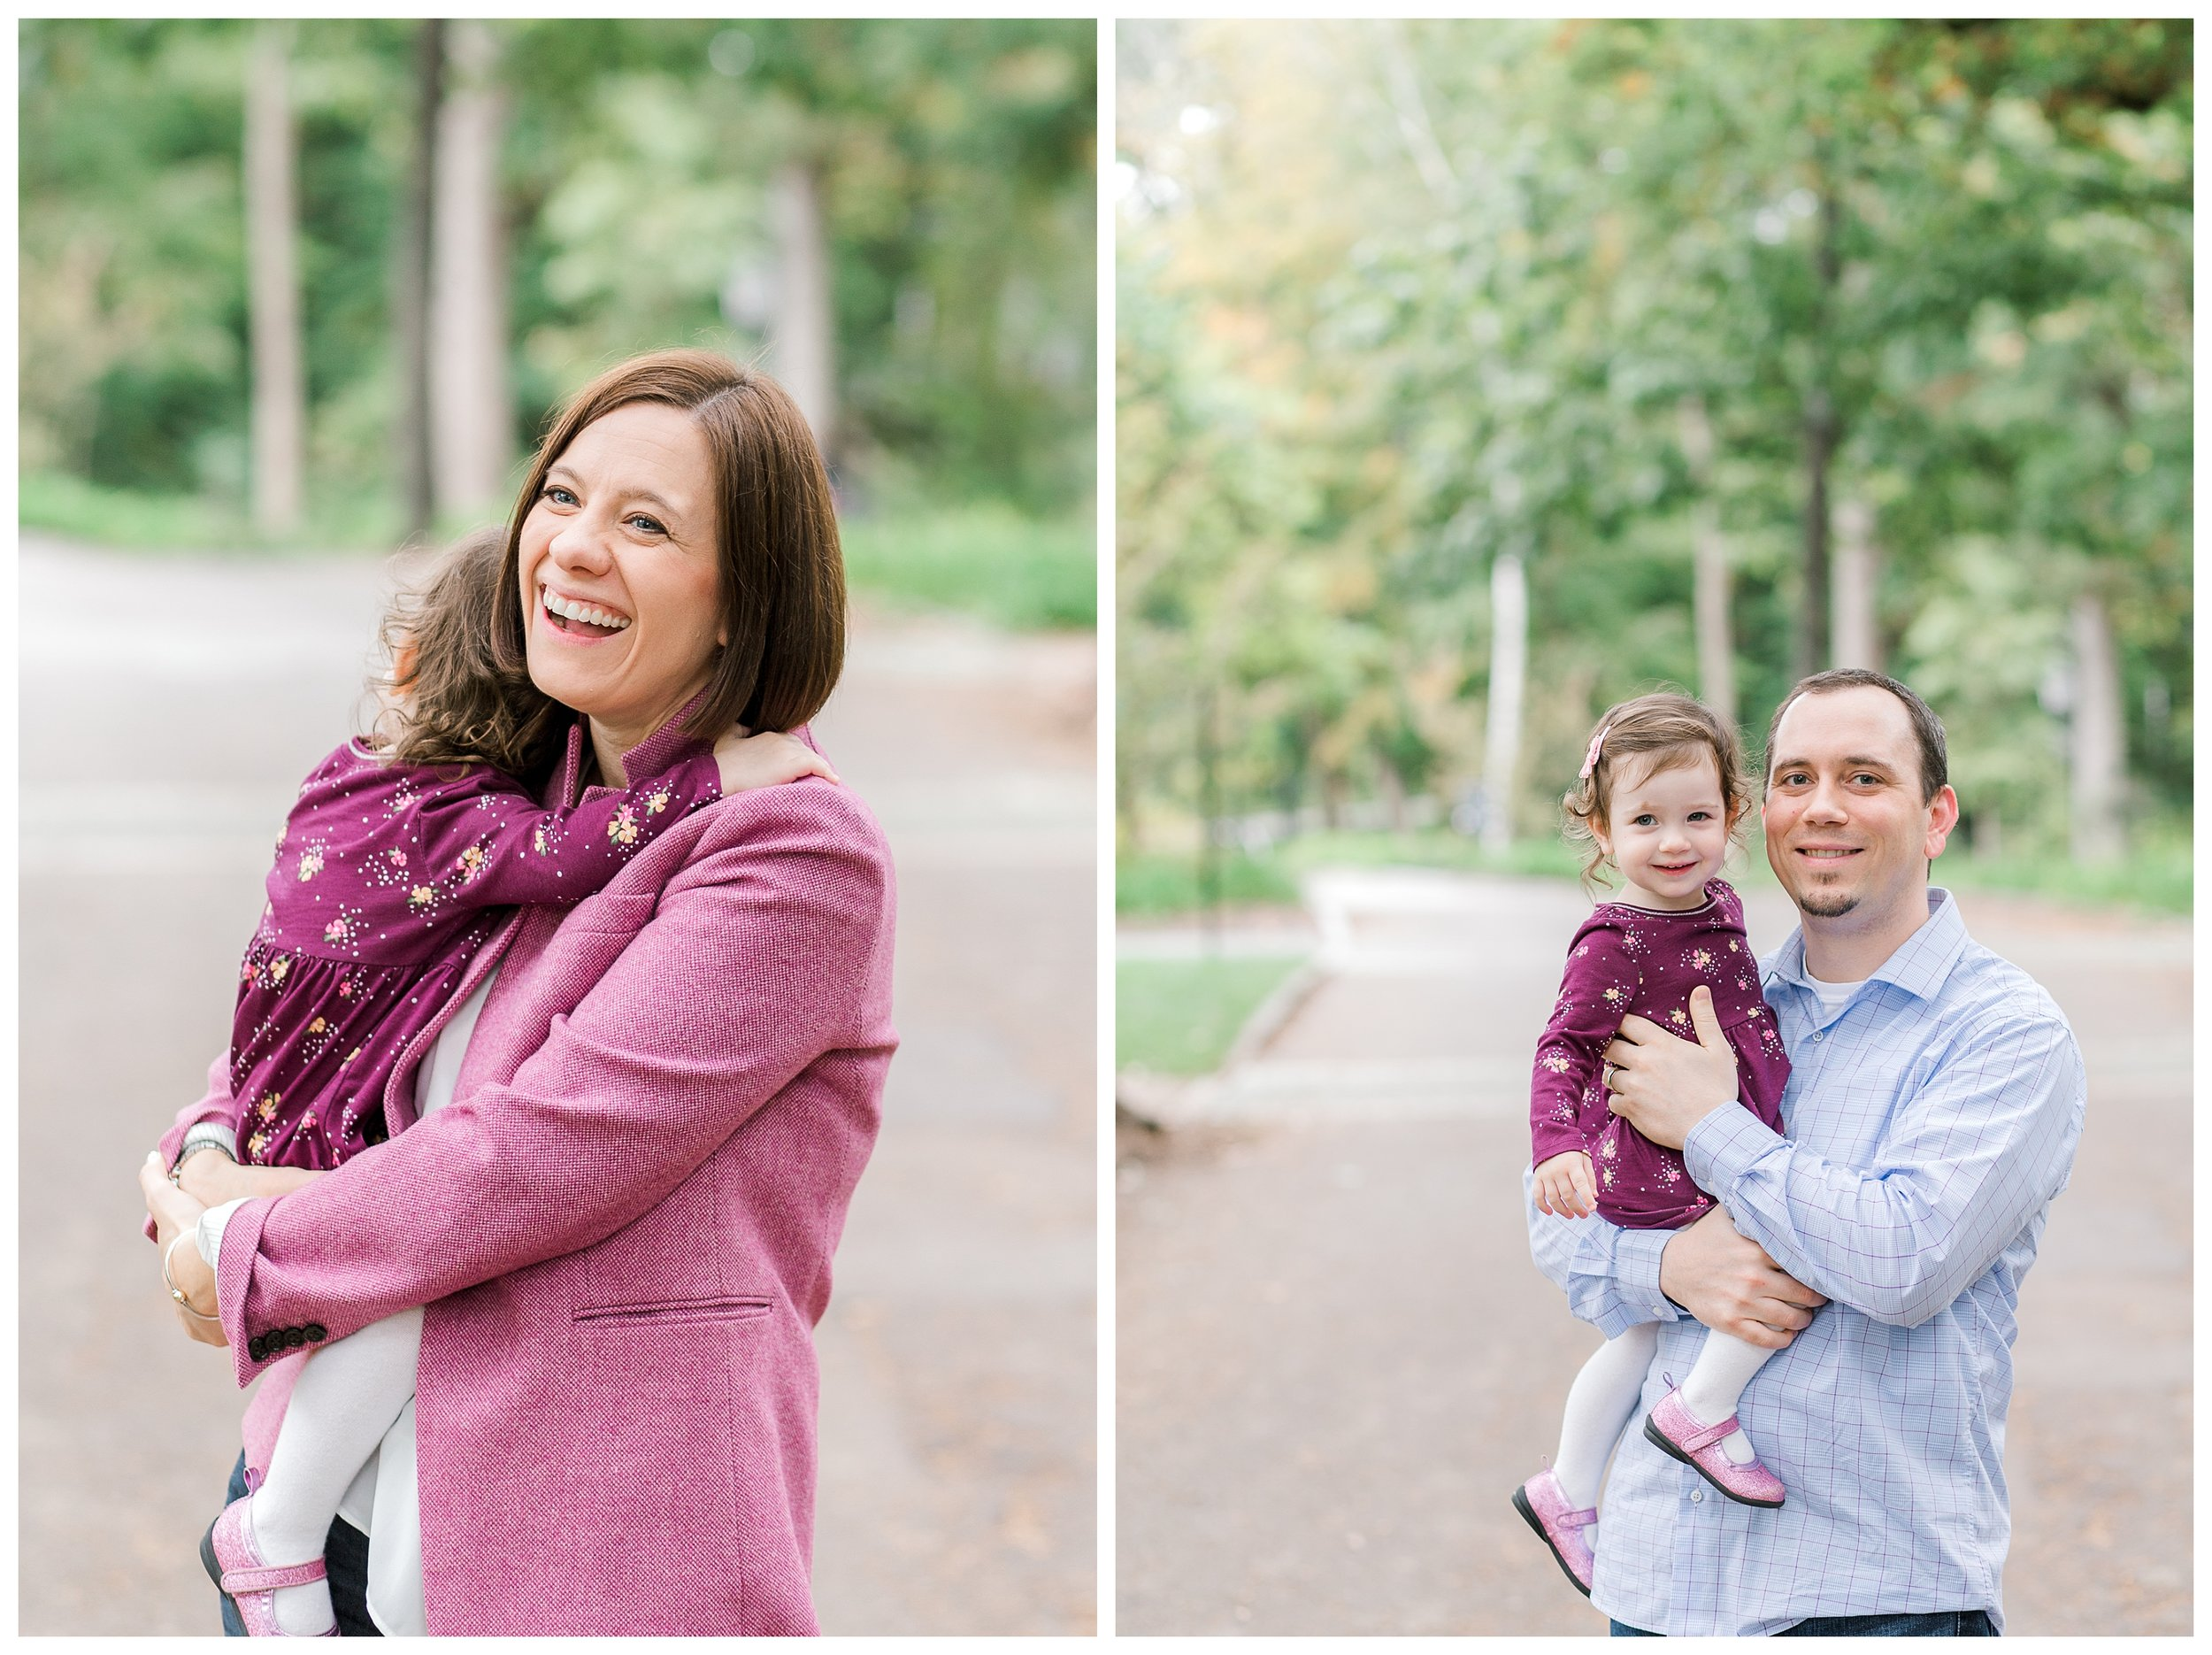 wellesley_family_photographer_erica_pezente_photo  (6).jpg